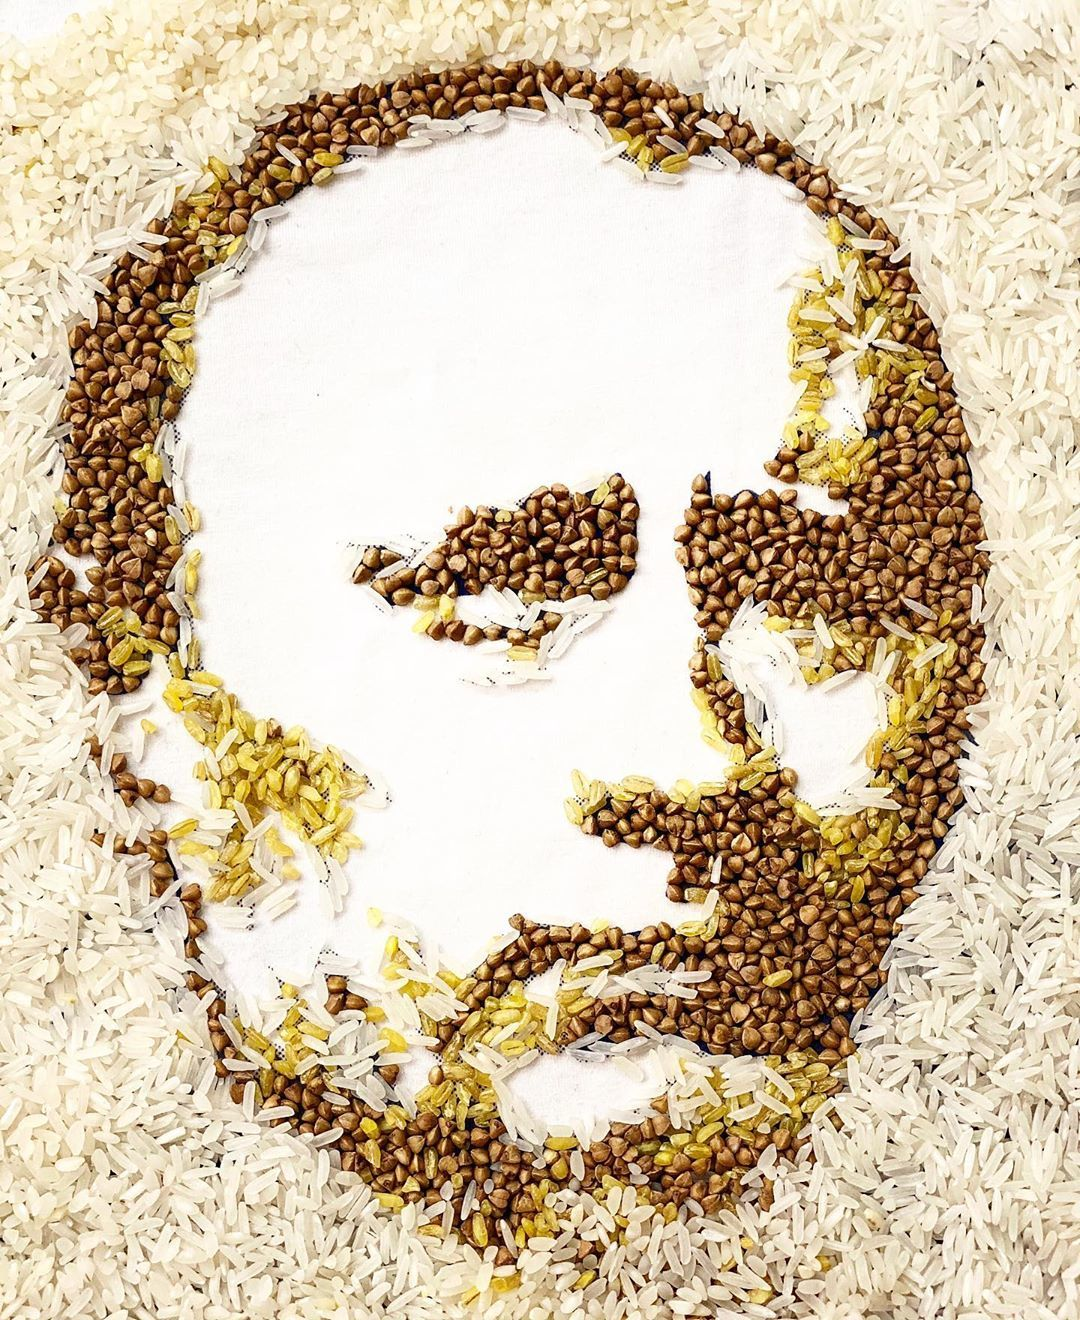 Якутянка сделала портрет Путина из гречки